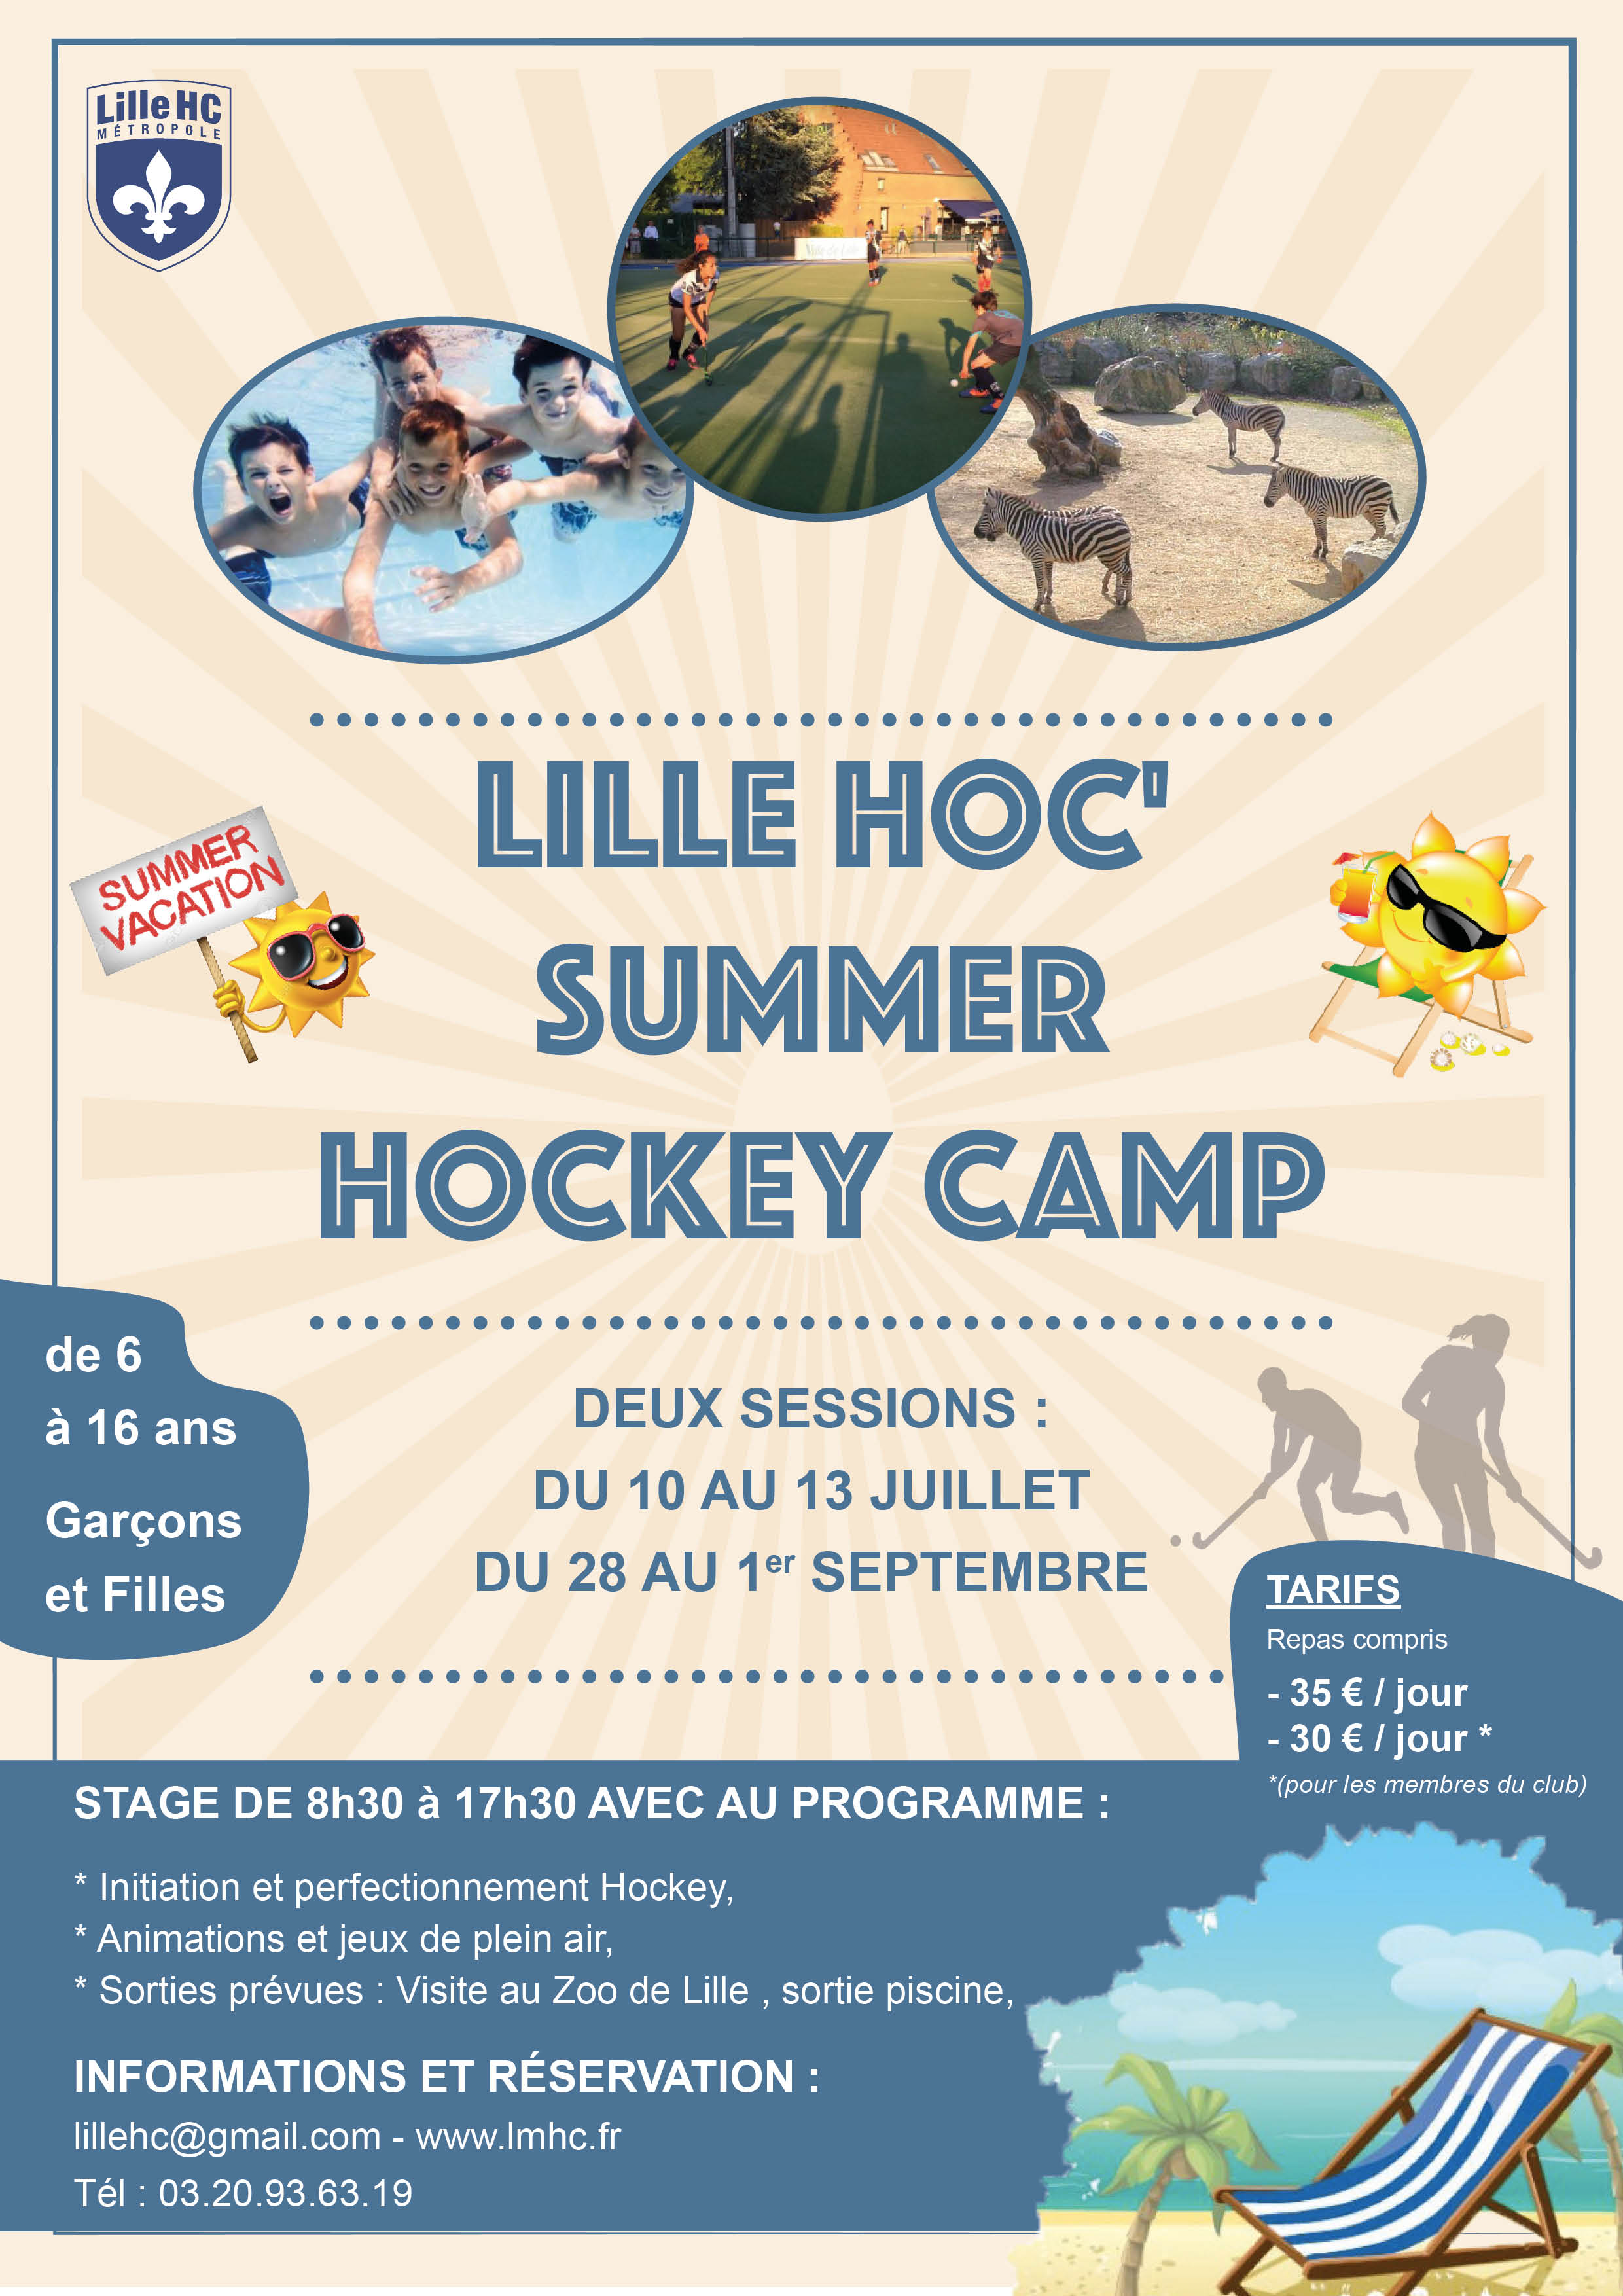 Lille Hoc Summer Hockey Camp